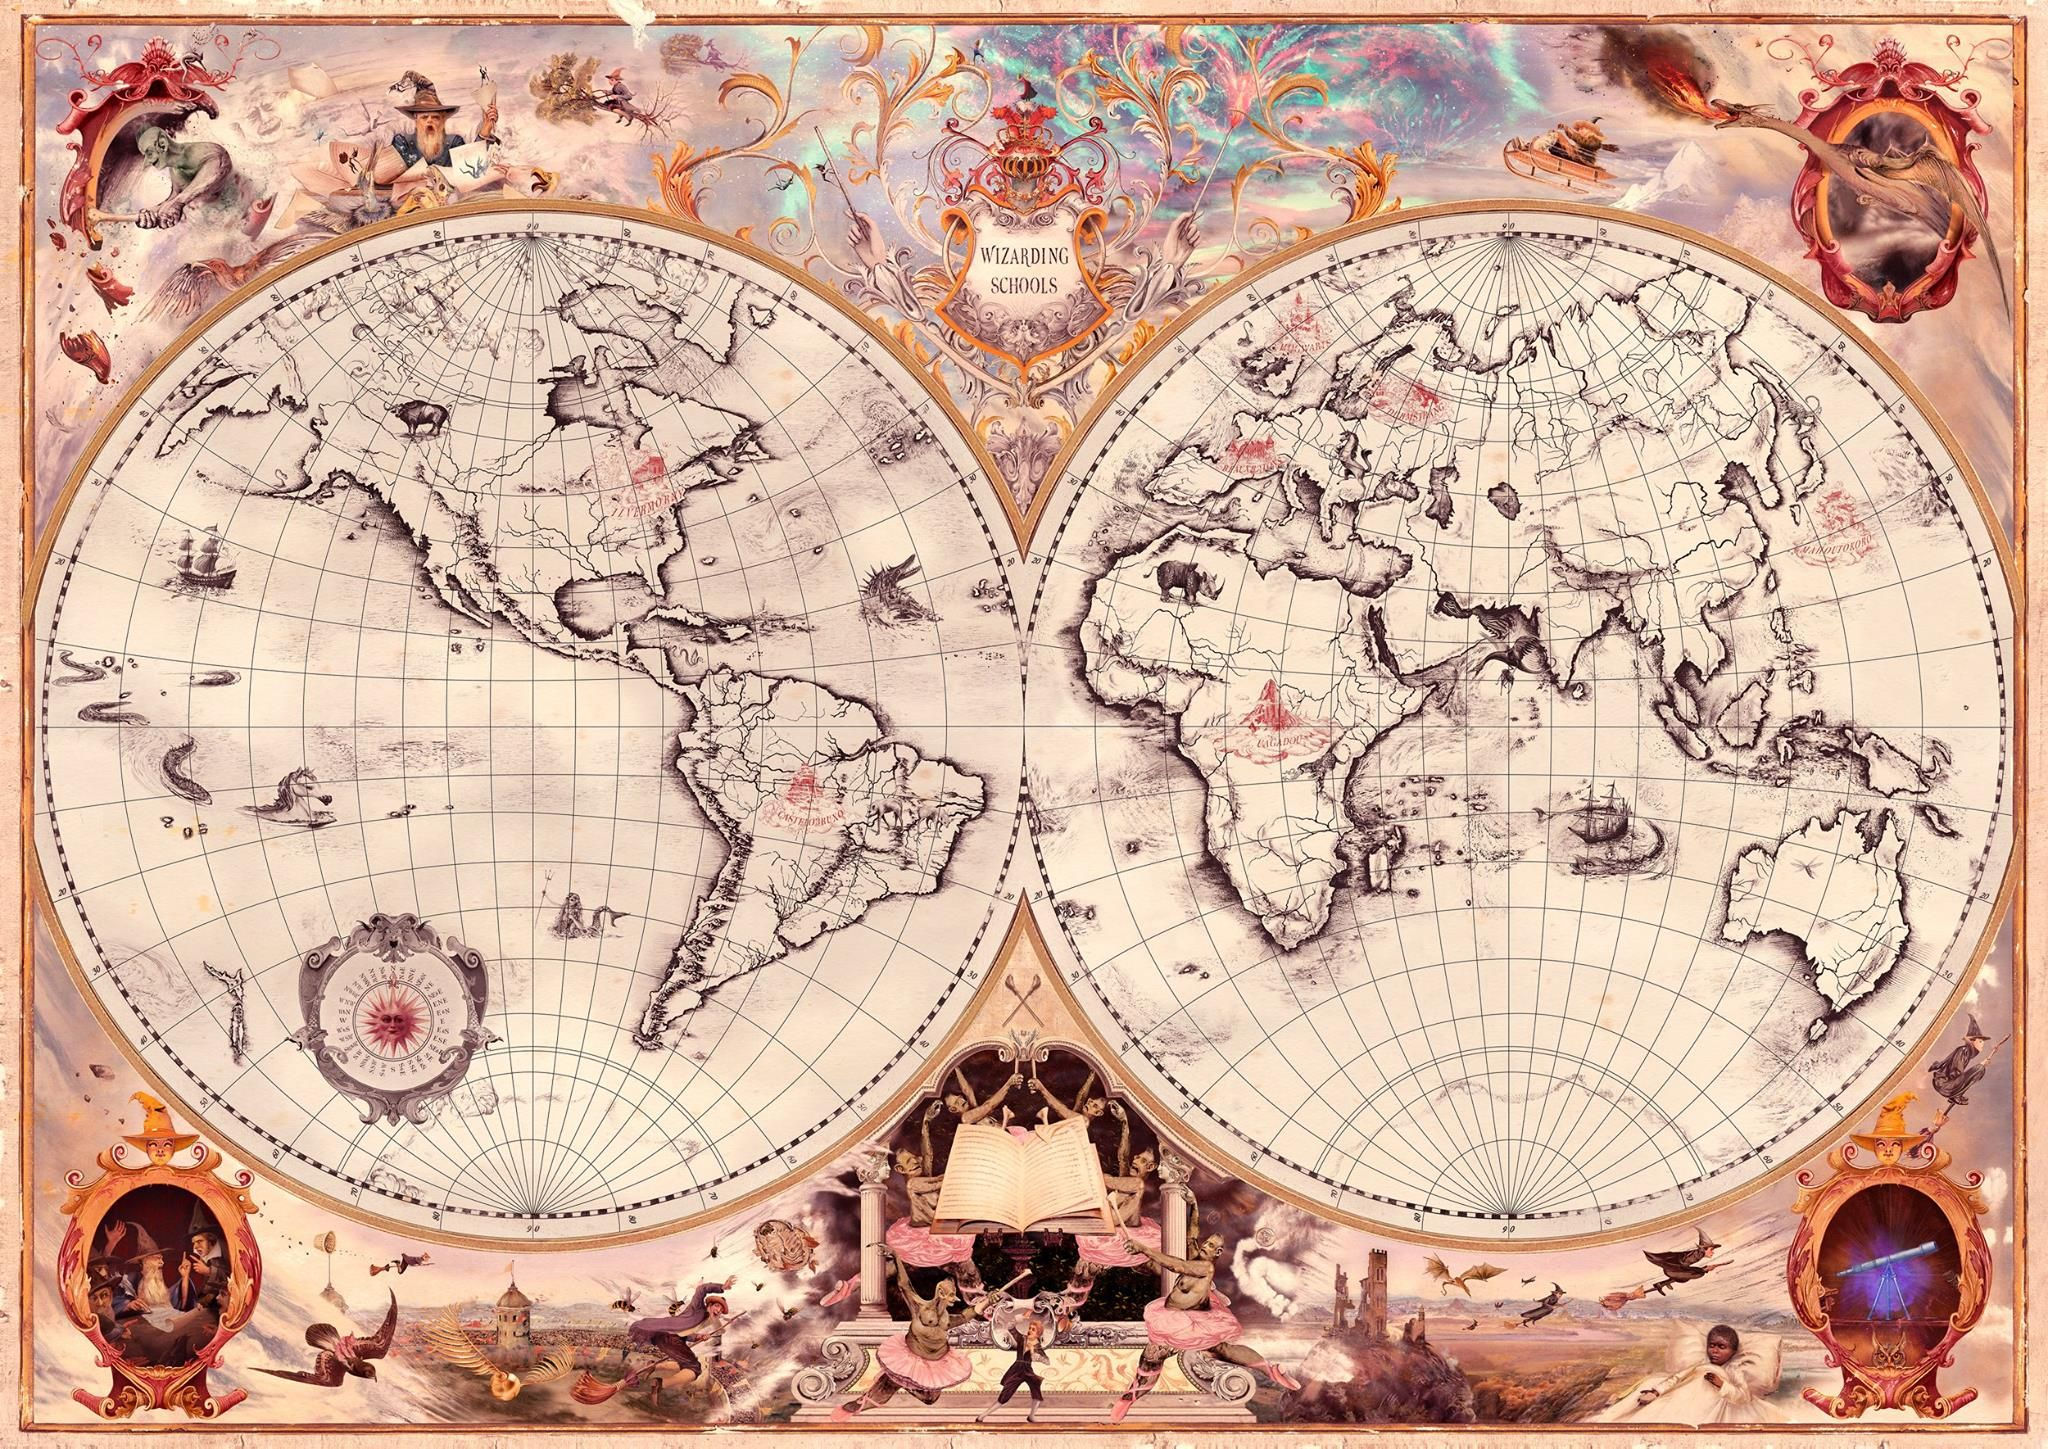 Wizarding Schools Map From Pottermore Escuela De Magia Harry Potter Hogwarts